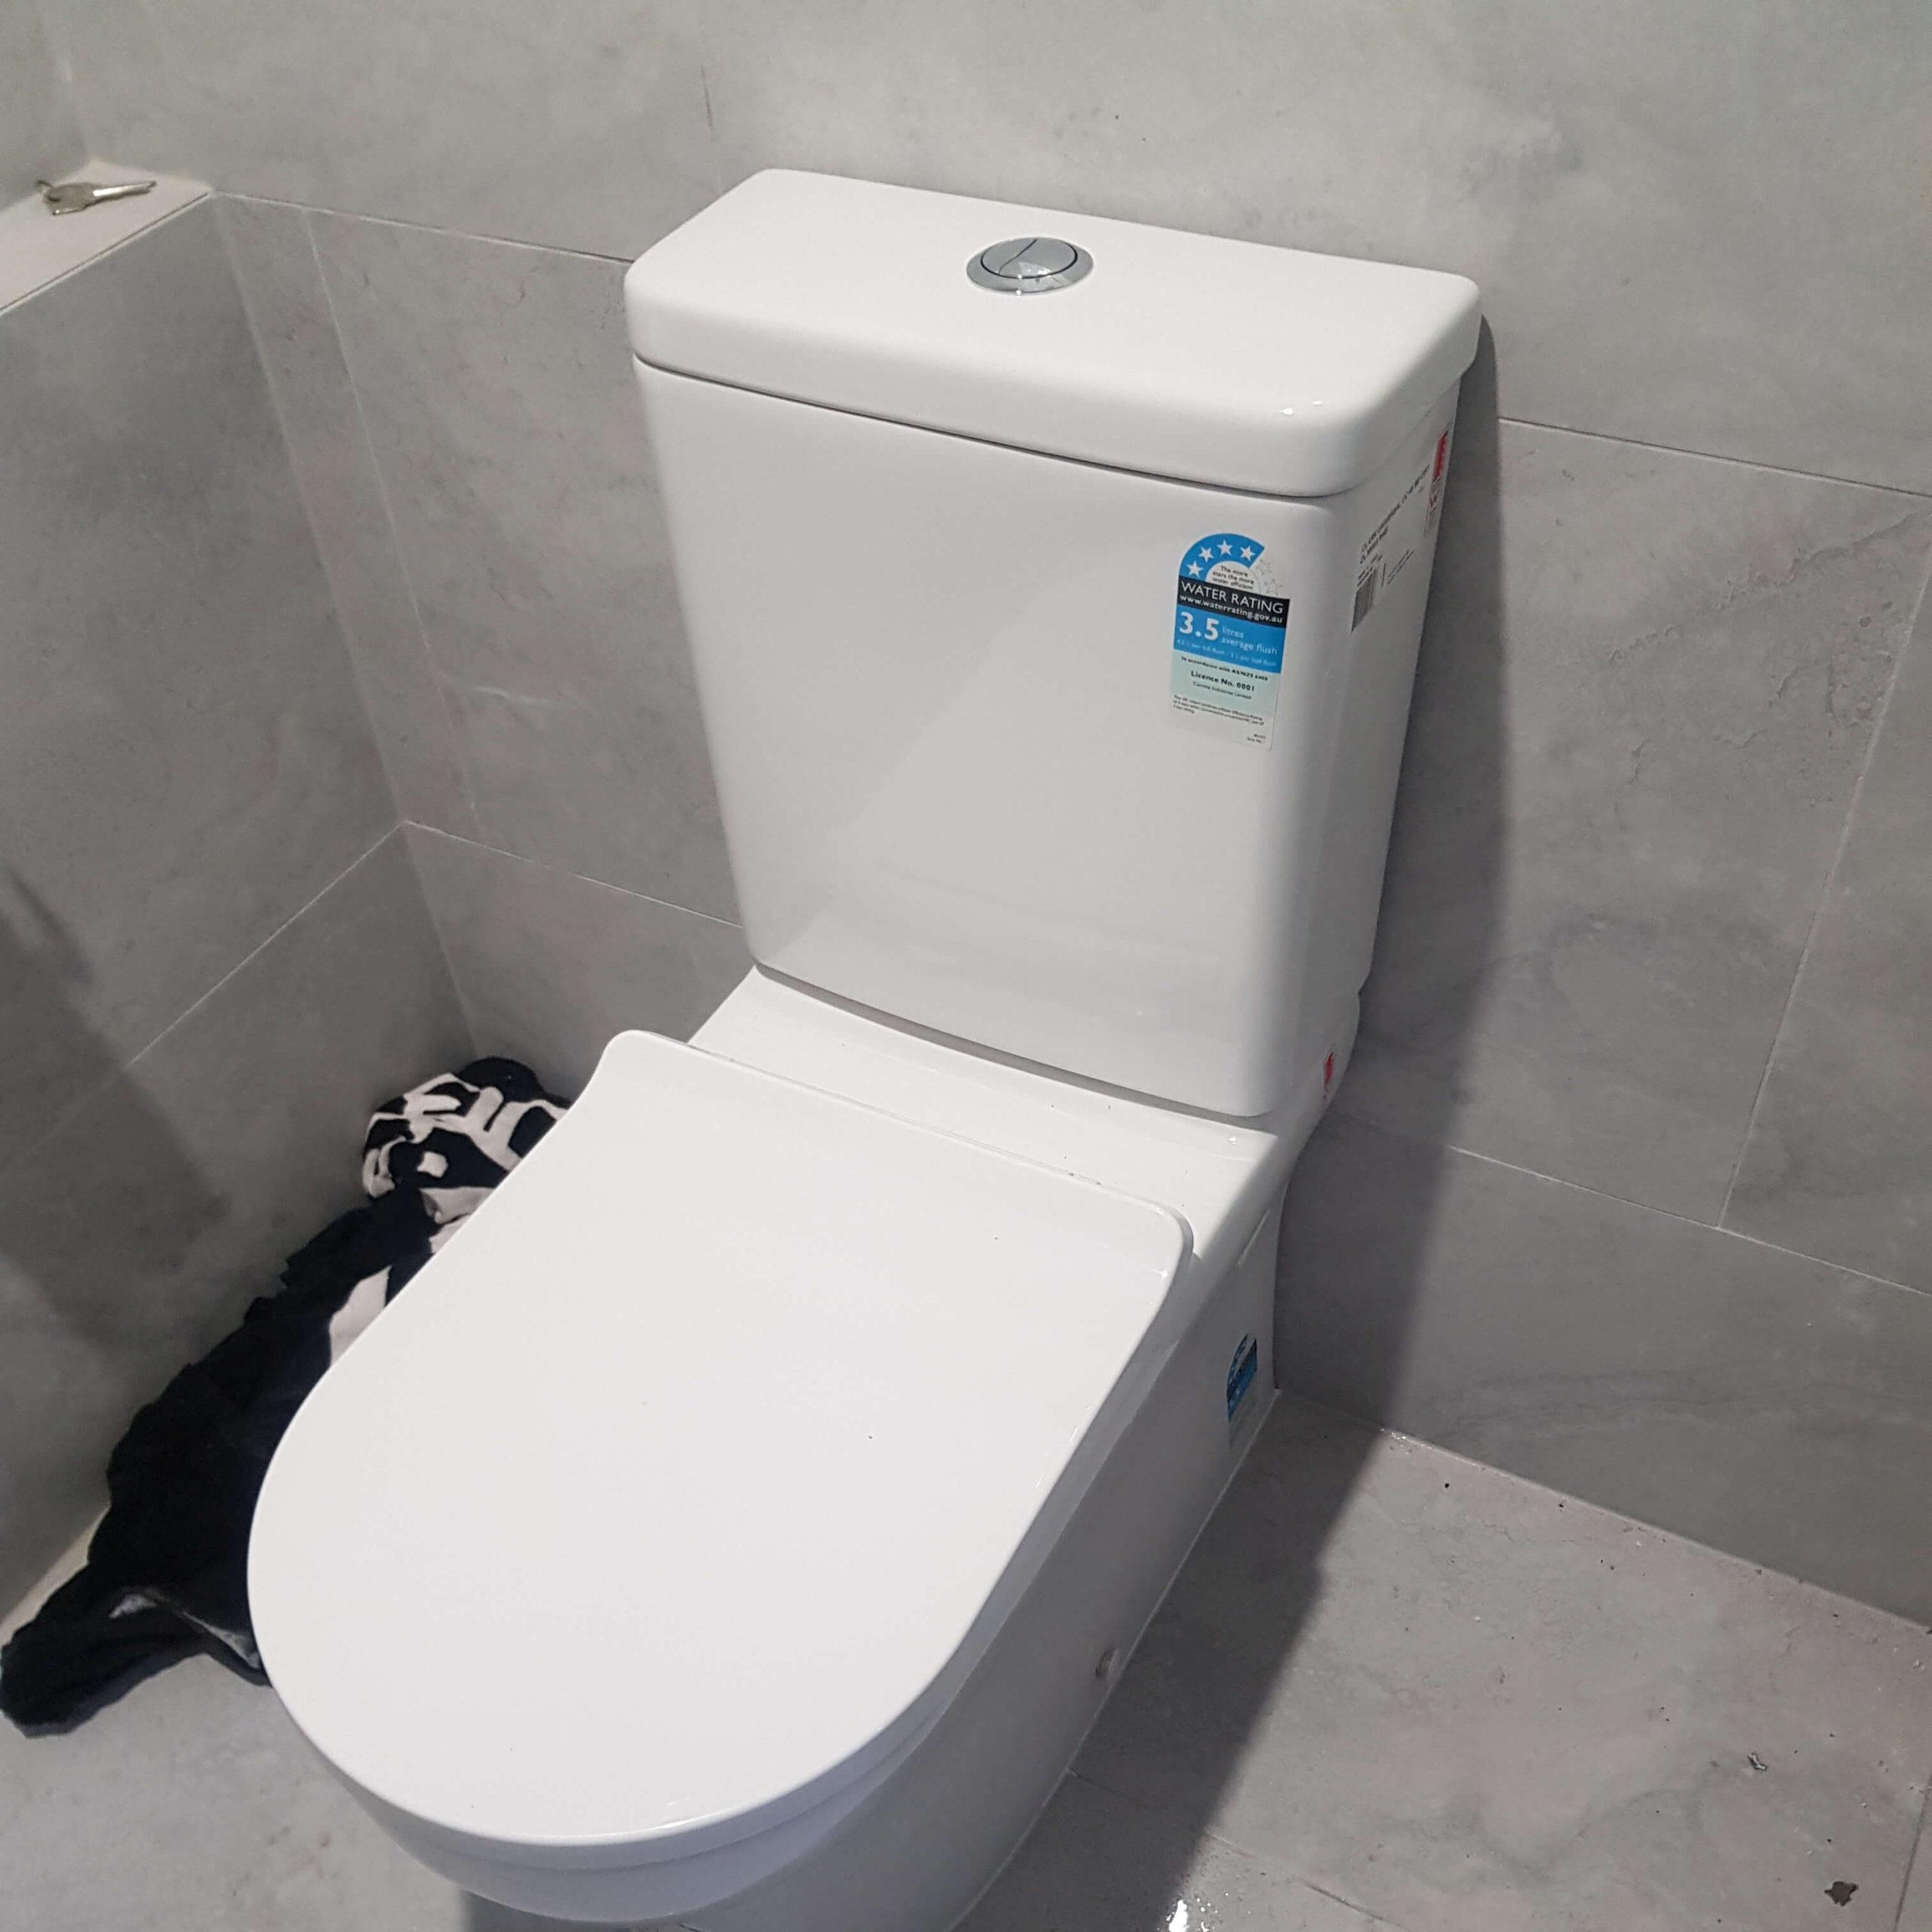 Blocked drain toilet